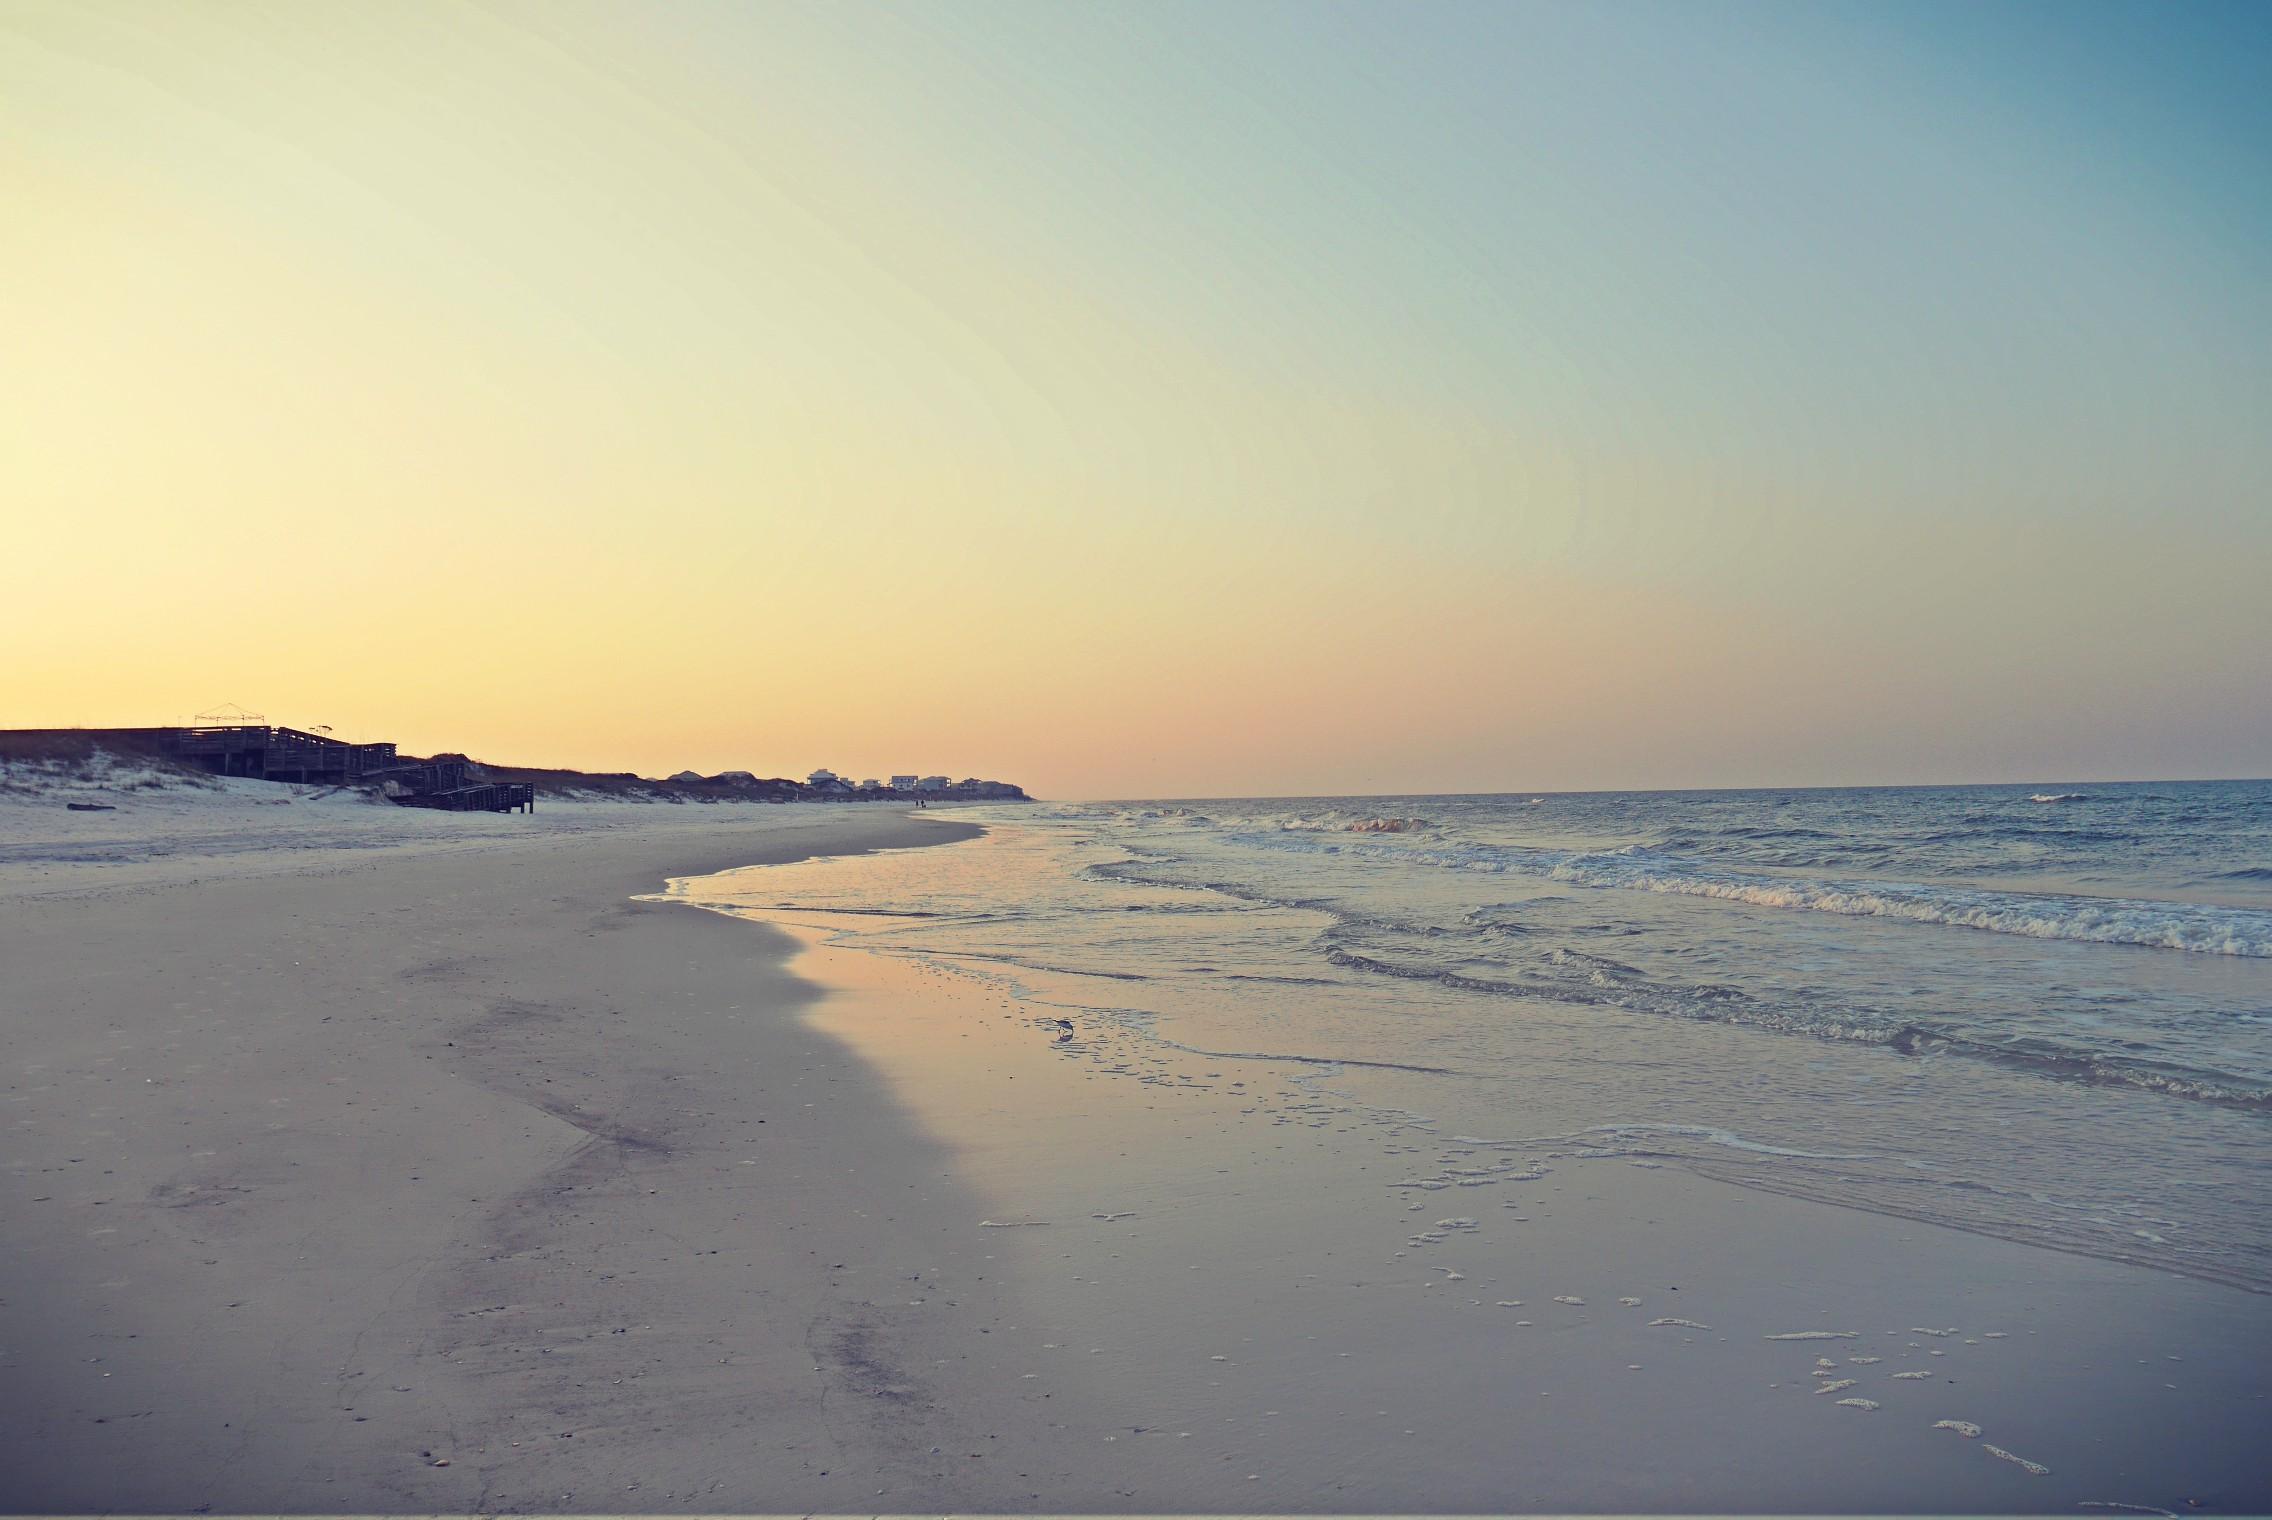 Cape San Blas, FL